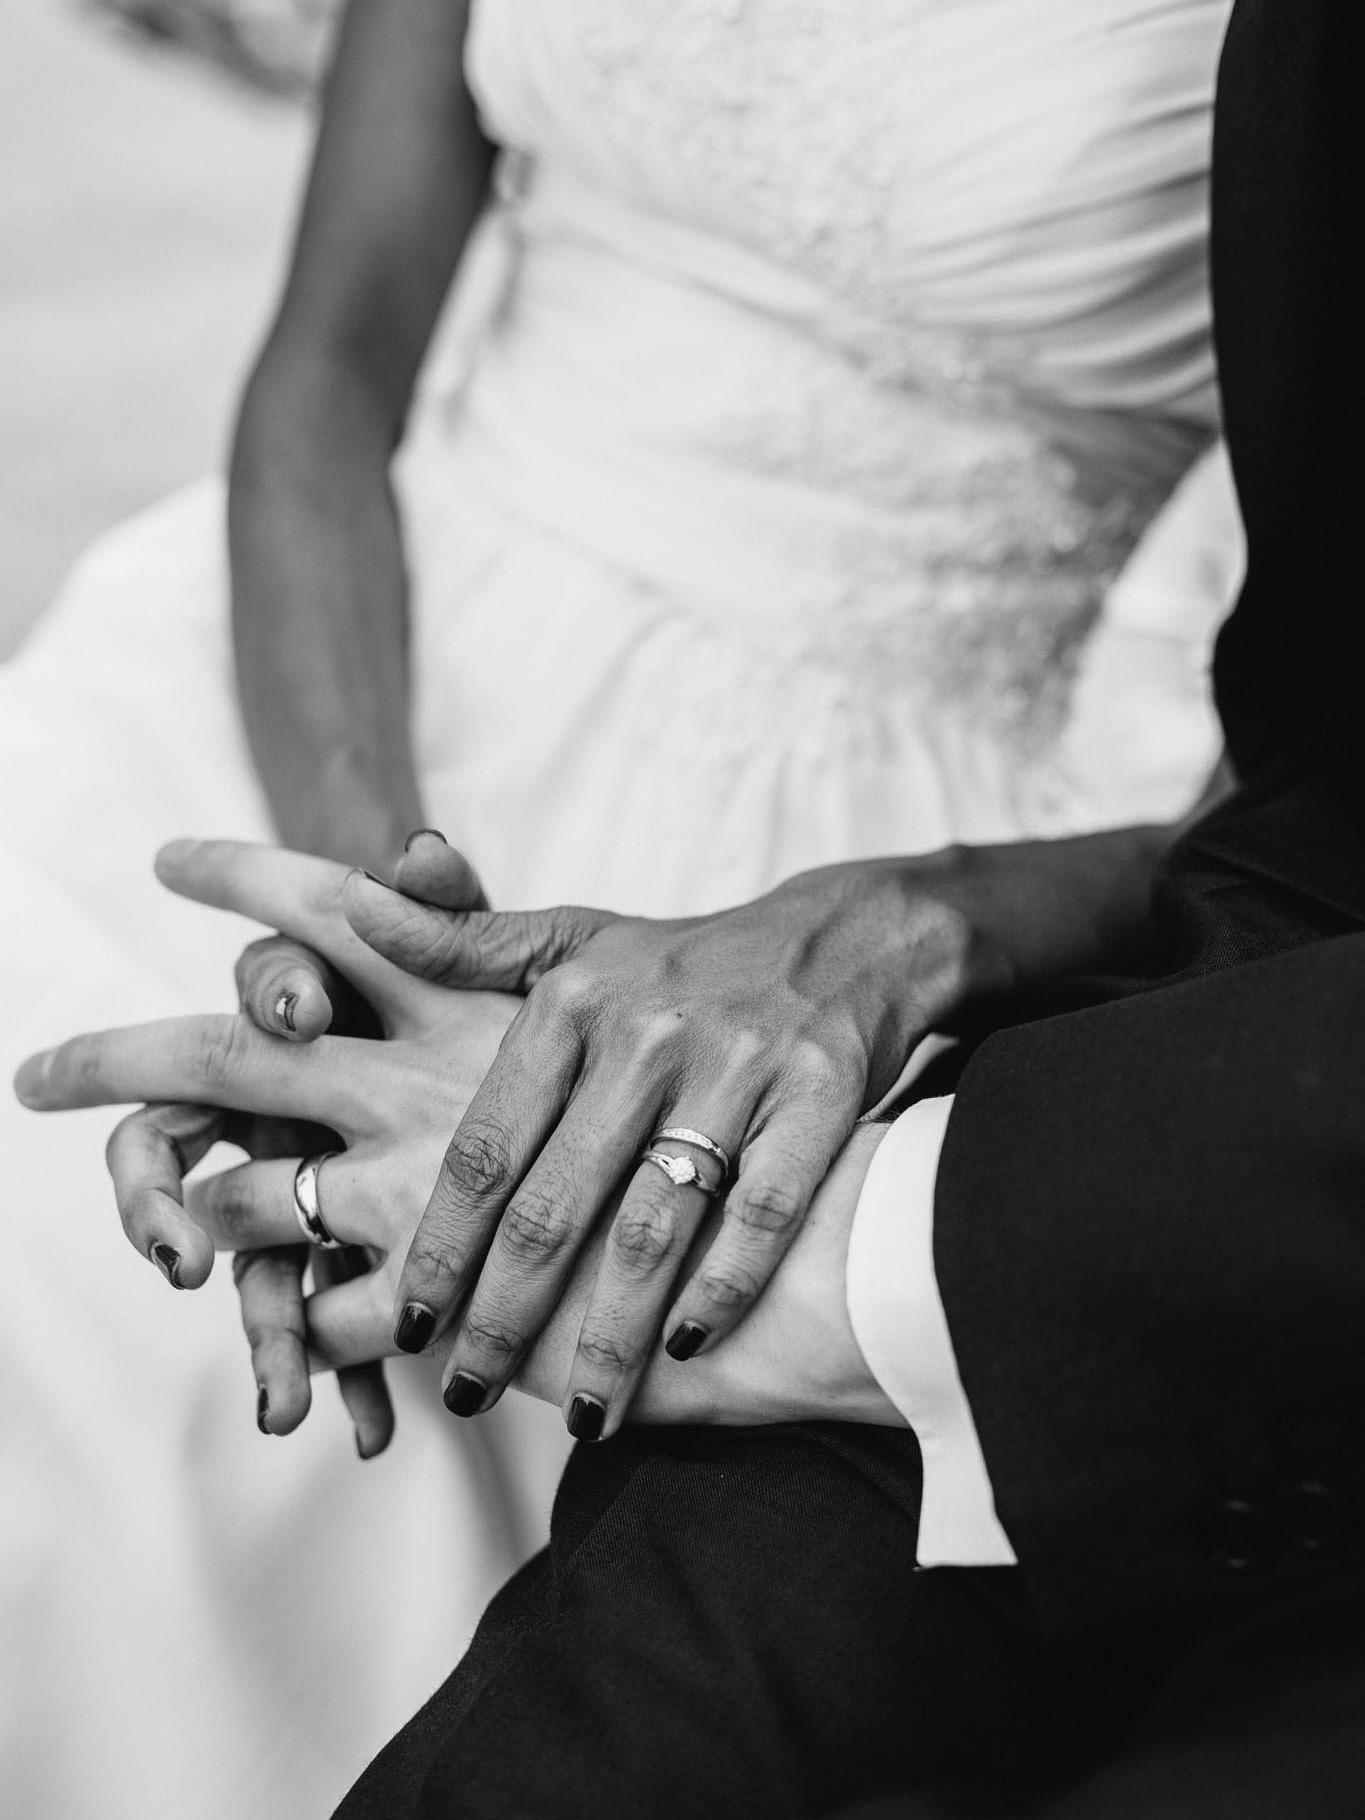 singapore-wedding-photographer-malay-indian-pre-wedding-travel-wmt-2015-42.jpg